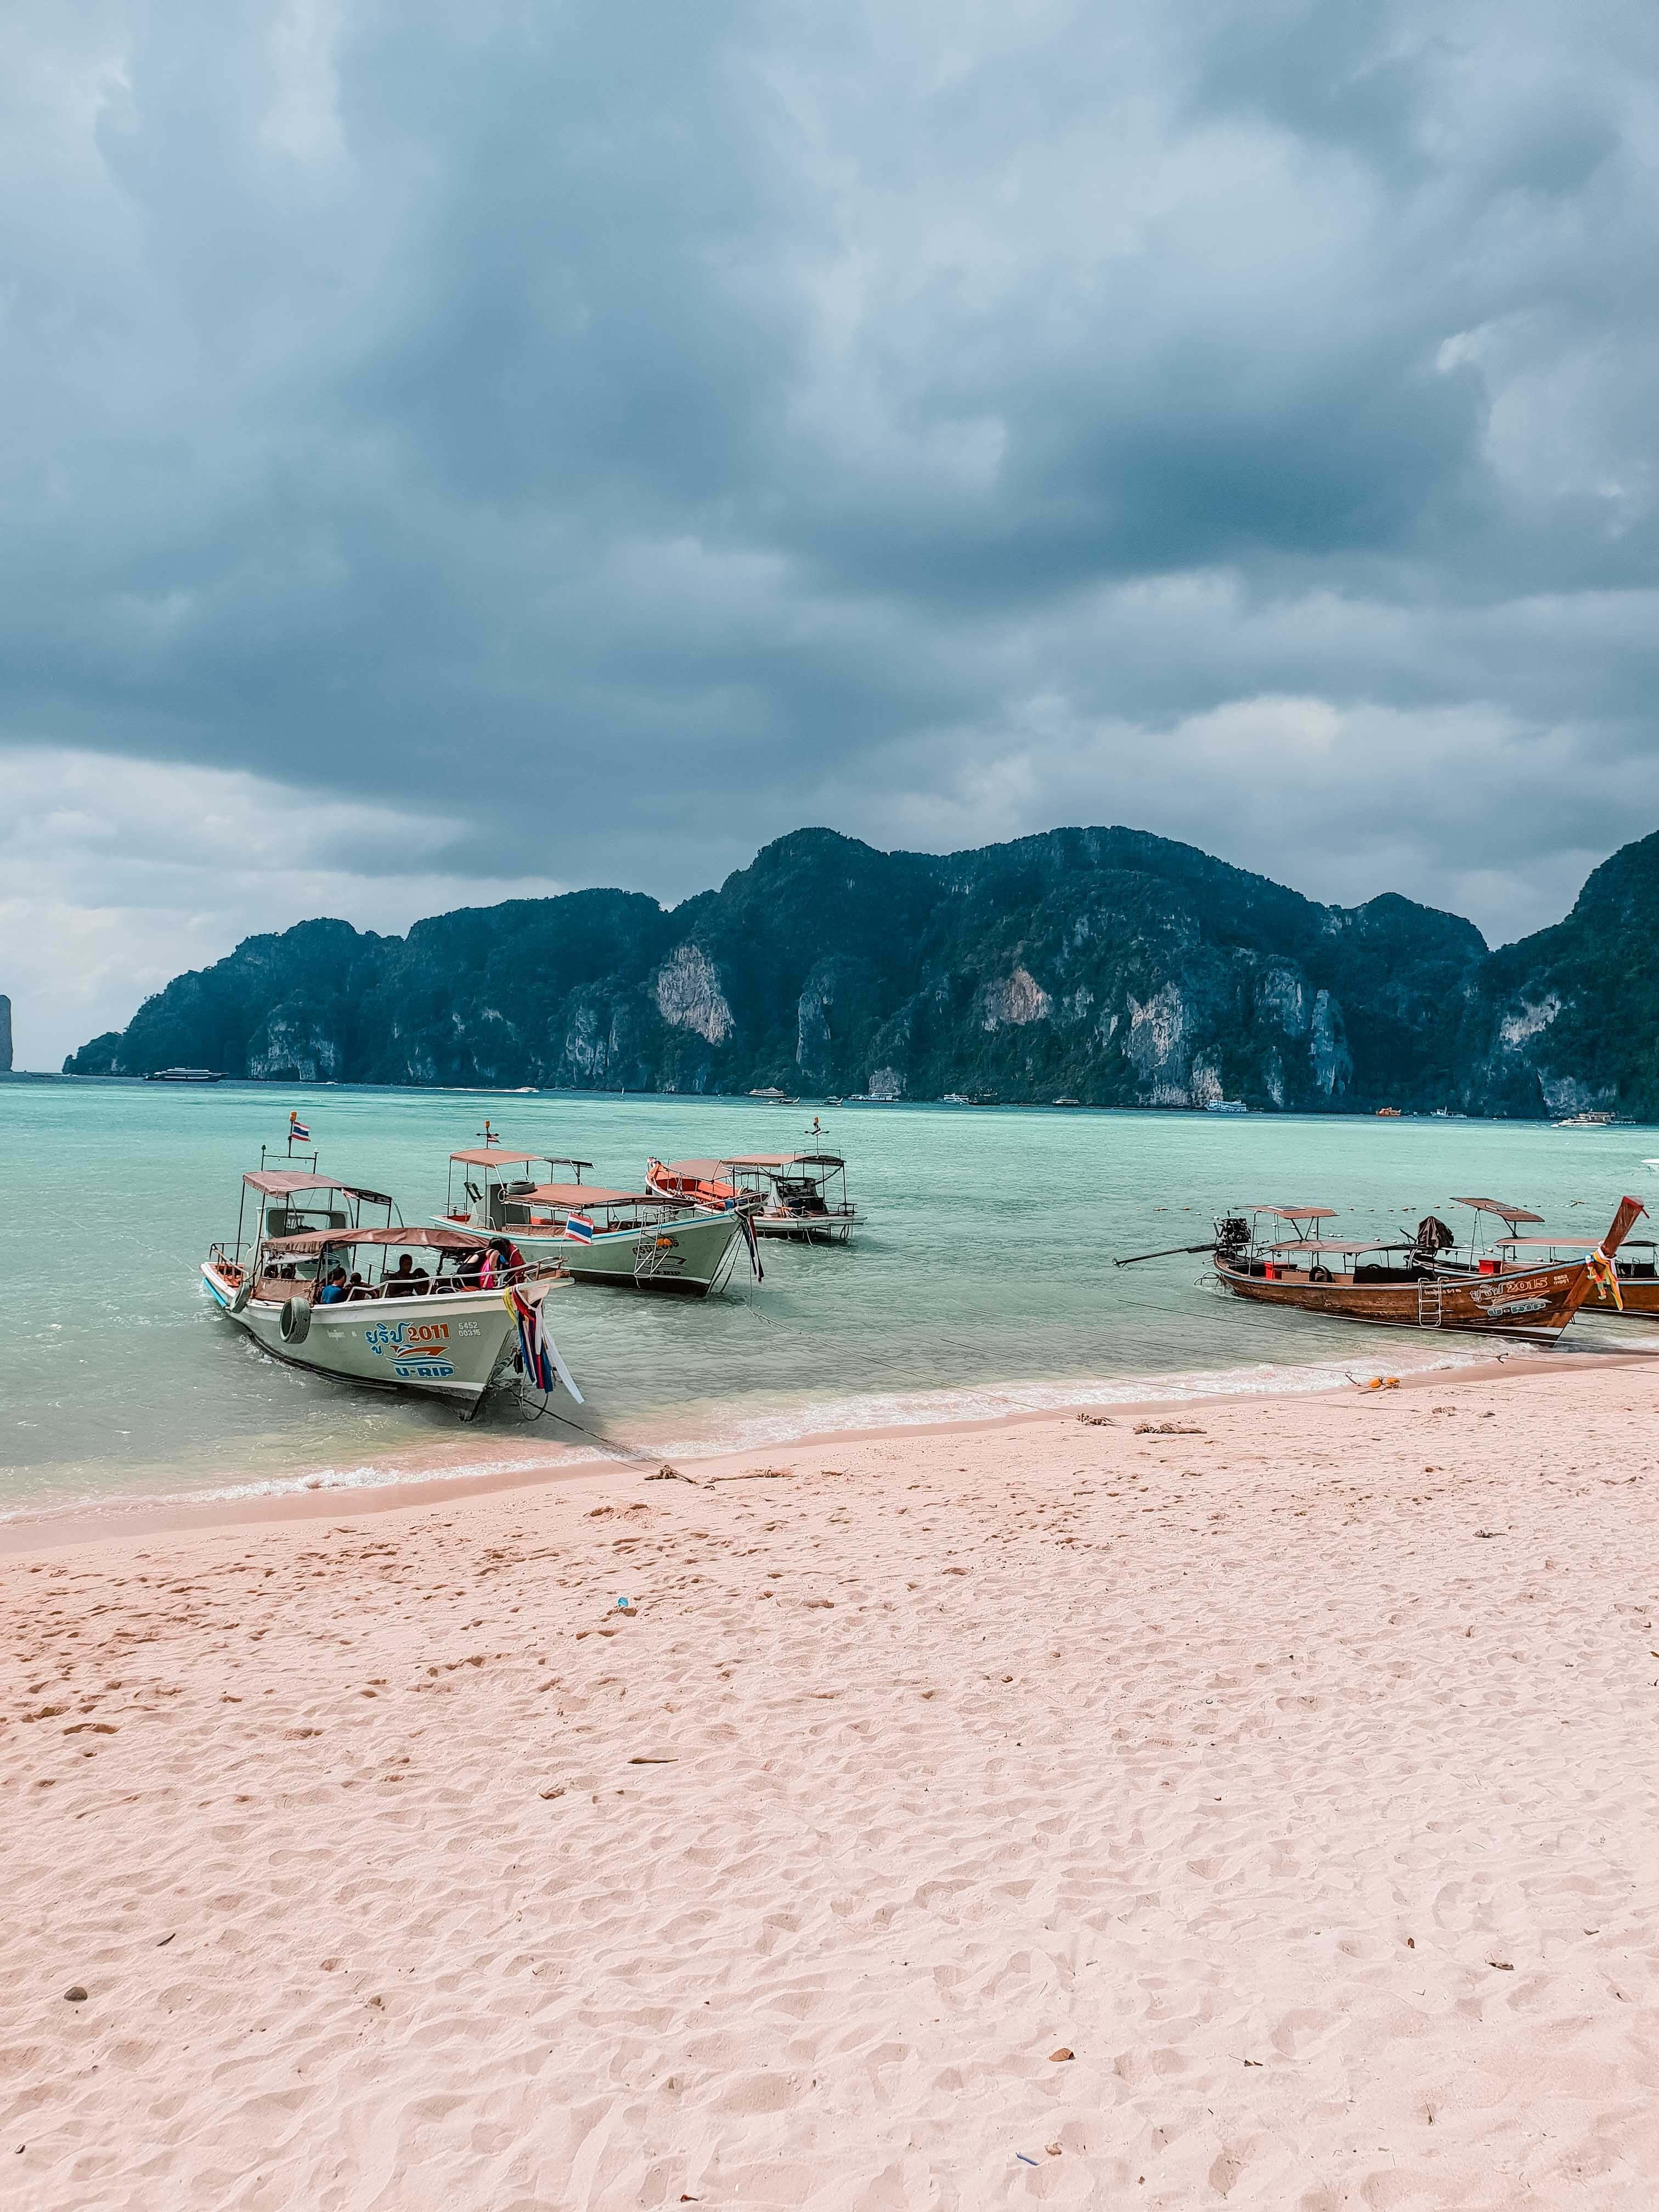 Thailand, Phuket, Urlaub, Asien, Travelguide, Reisebericht, Reisetipps, Sehenswürdigkeiten, Tipps, Katefully, Reiseblog, Travel, Phi Phi Island, Pullman Phuket, Phi Phi Island